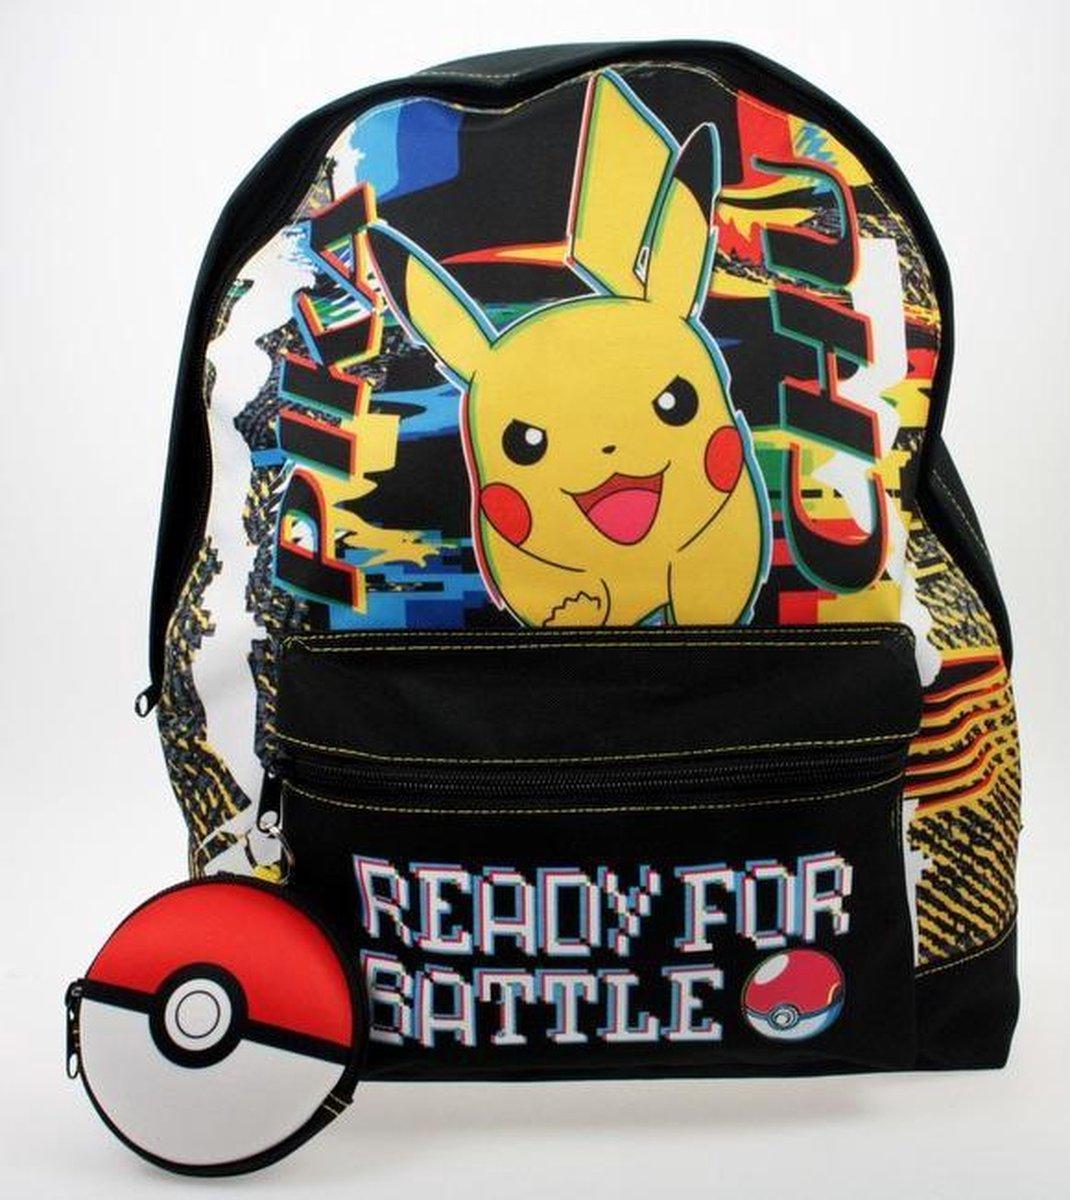 Pokémon Rugzak Jongens 16 Liter 36 X 24 Cm Polyester Zwart/geel